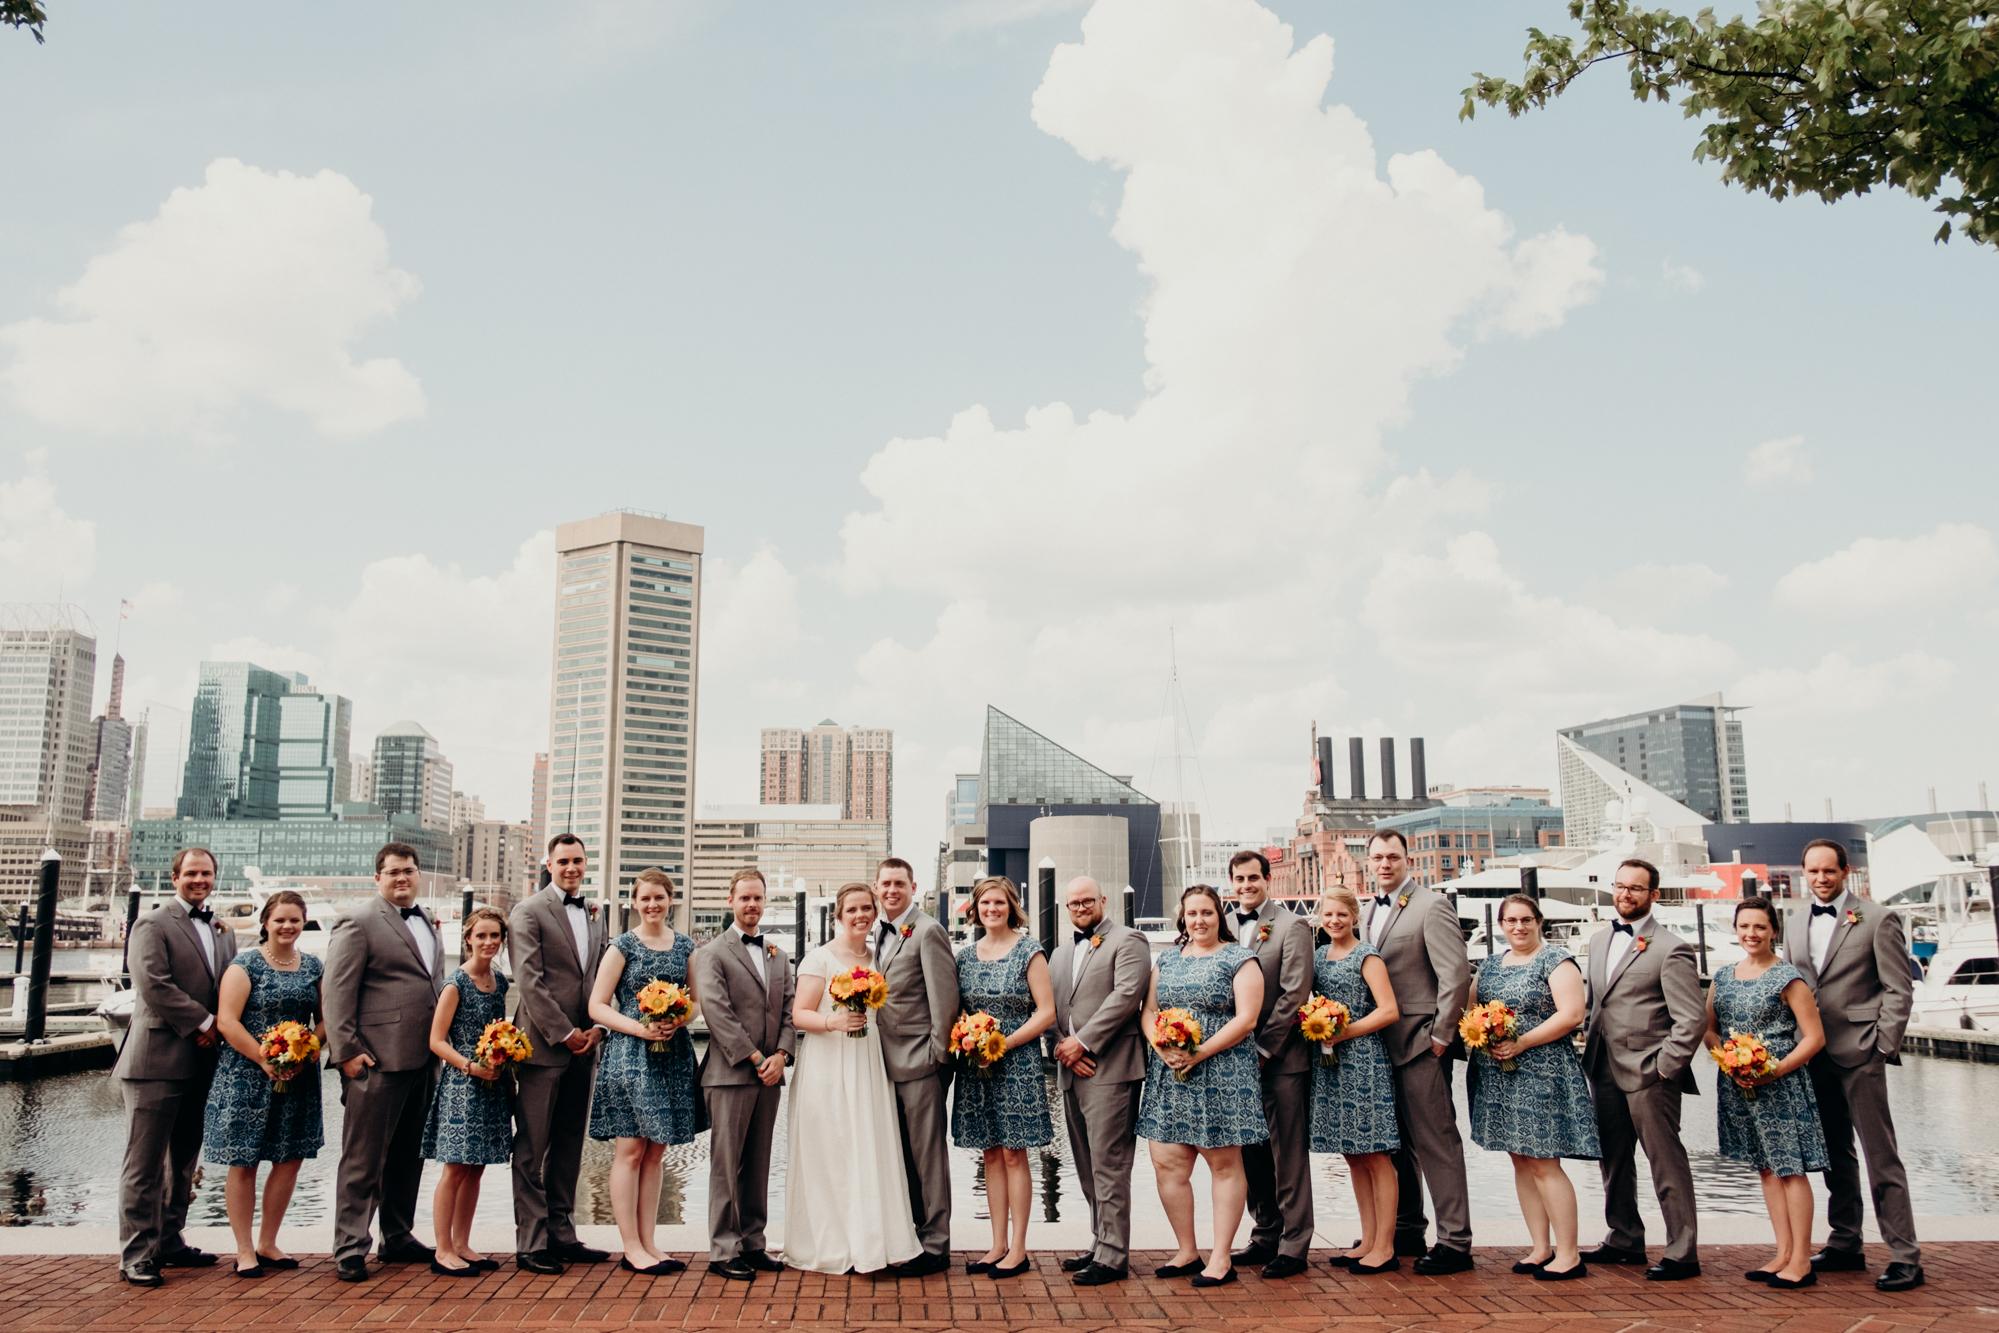 catholic-social-teaching-wedding-16.jpg